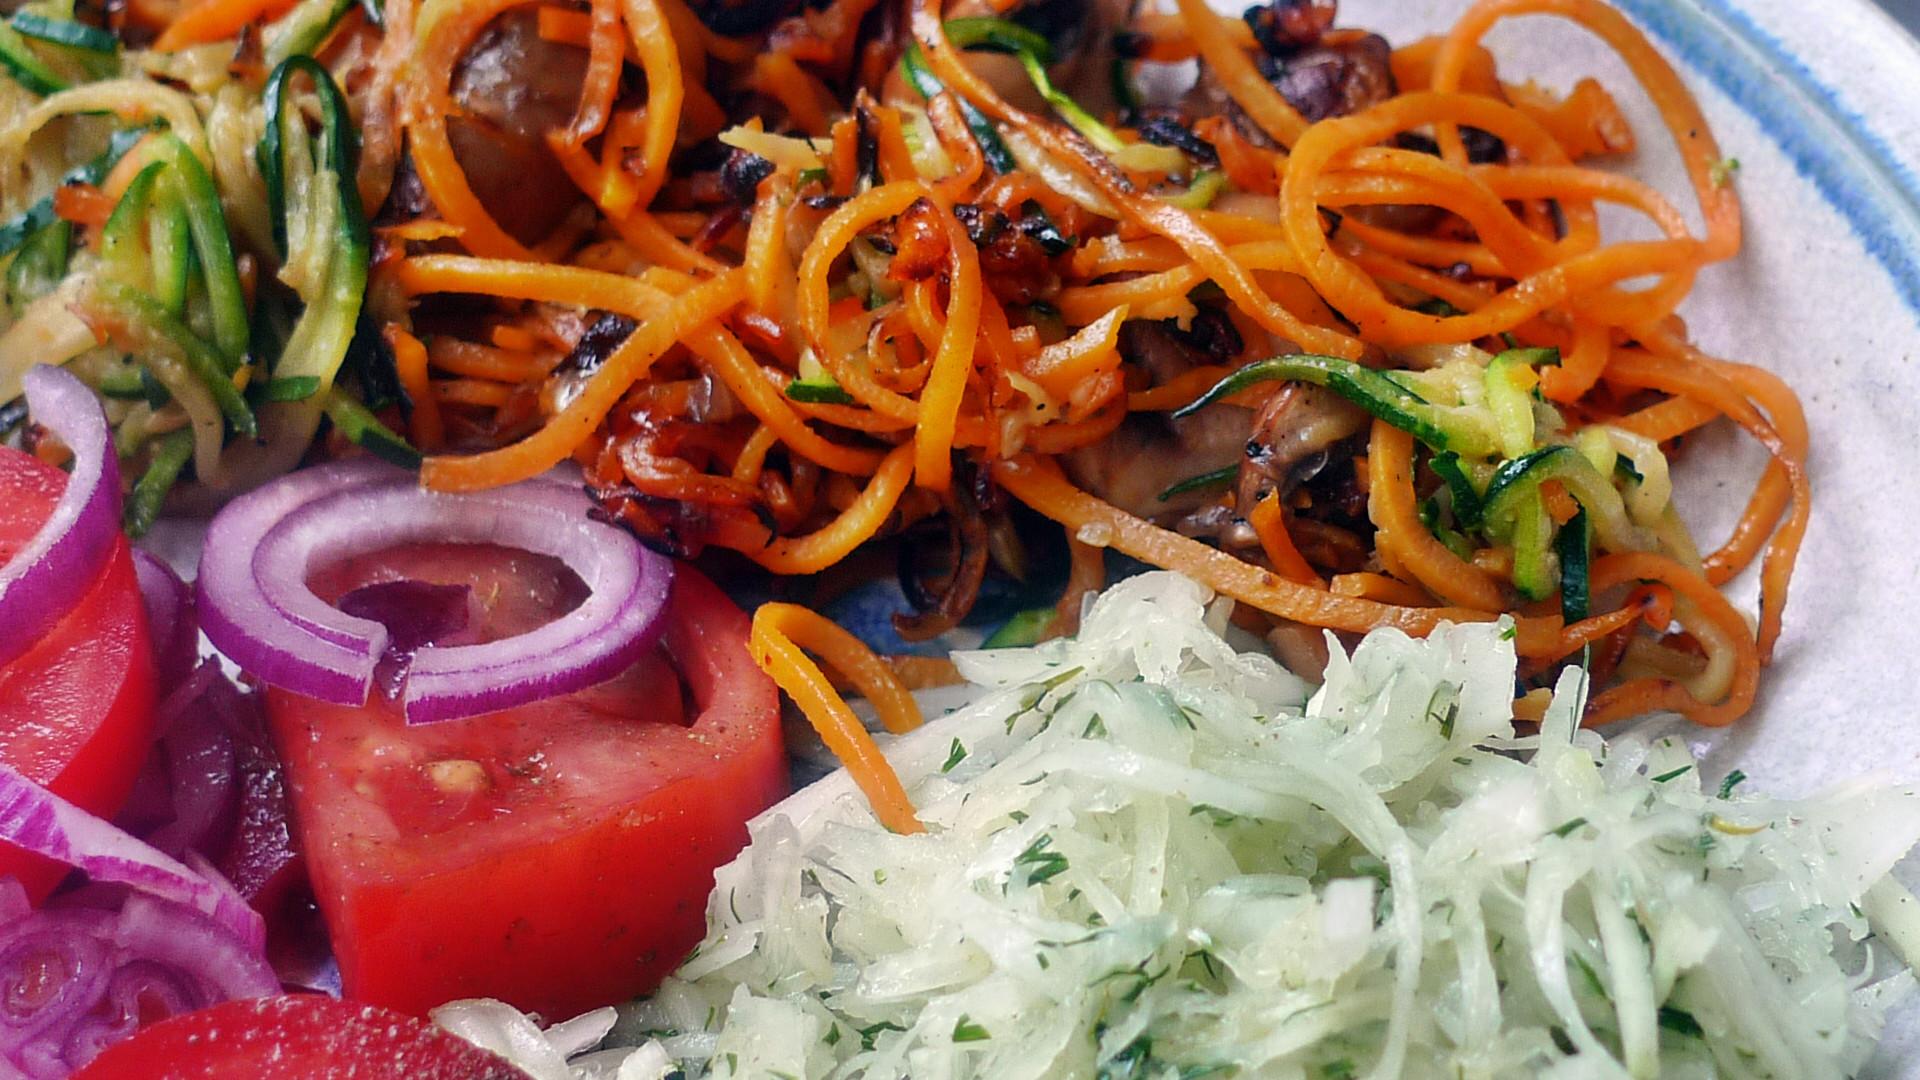 Gemüsespaghetti mit Champignon,Kohlrabisalat,Tomatensalat,vegan -5.5.15   (14)